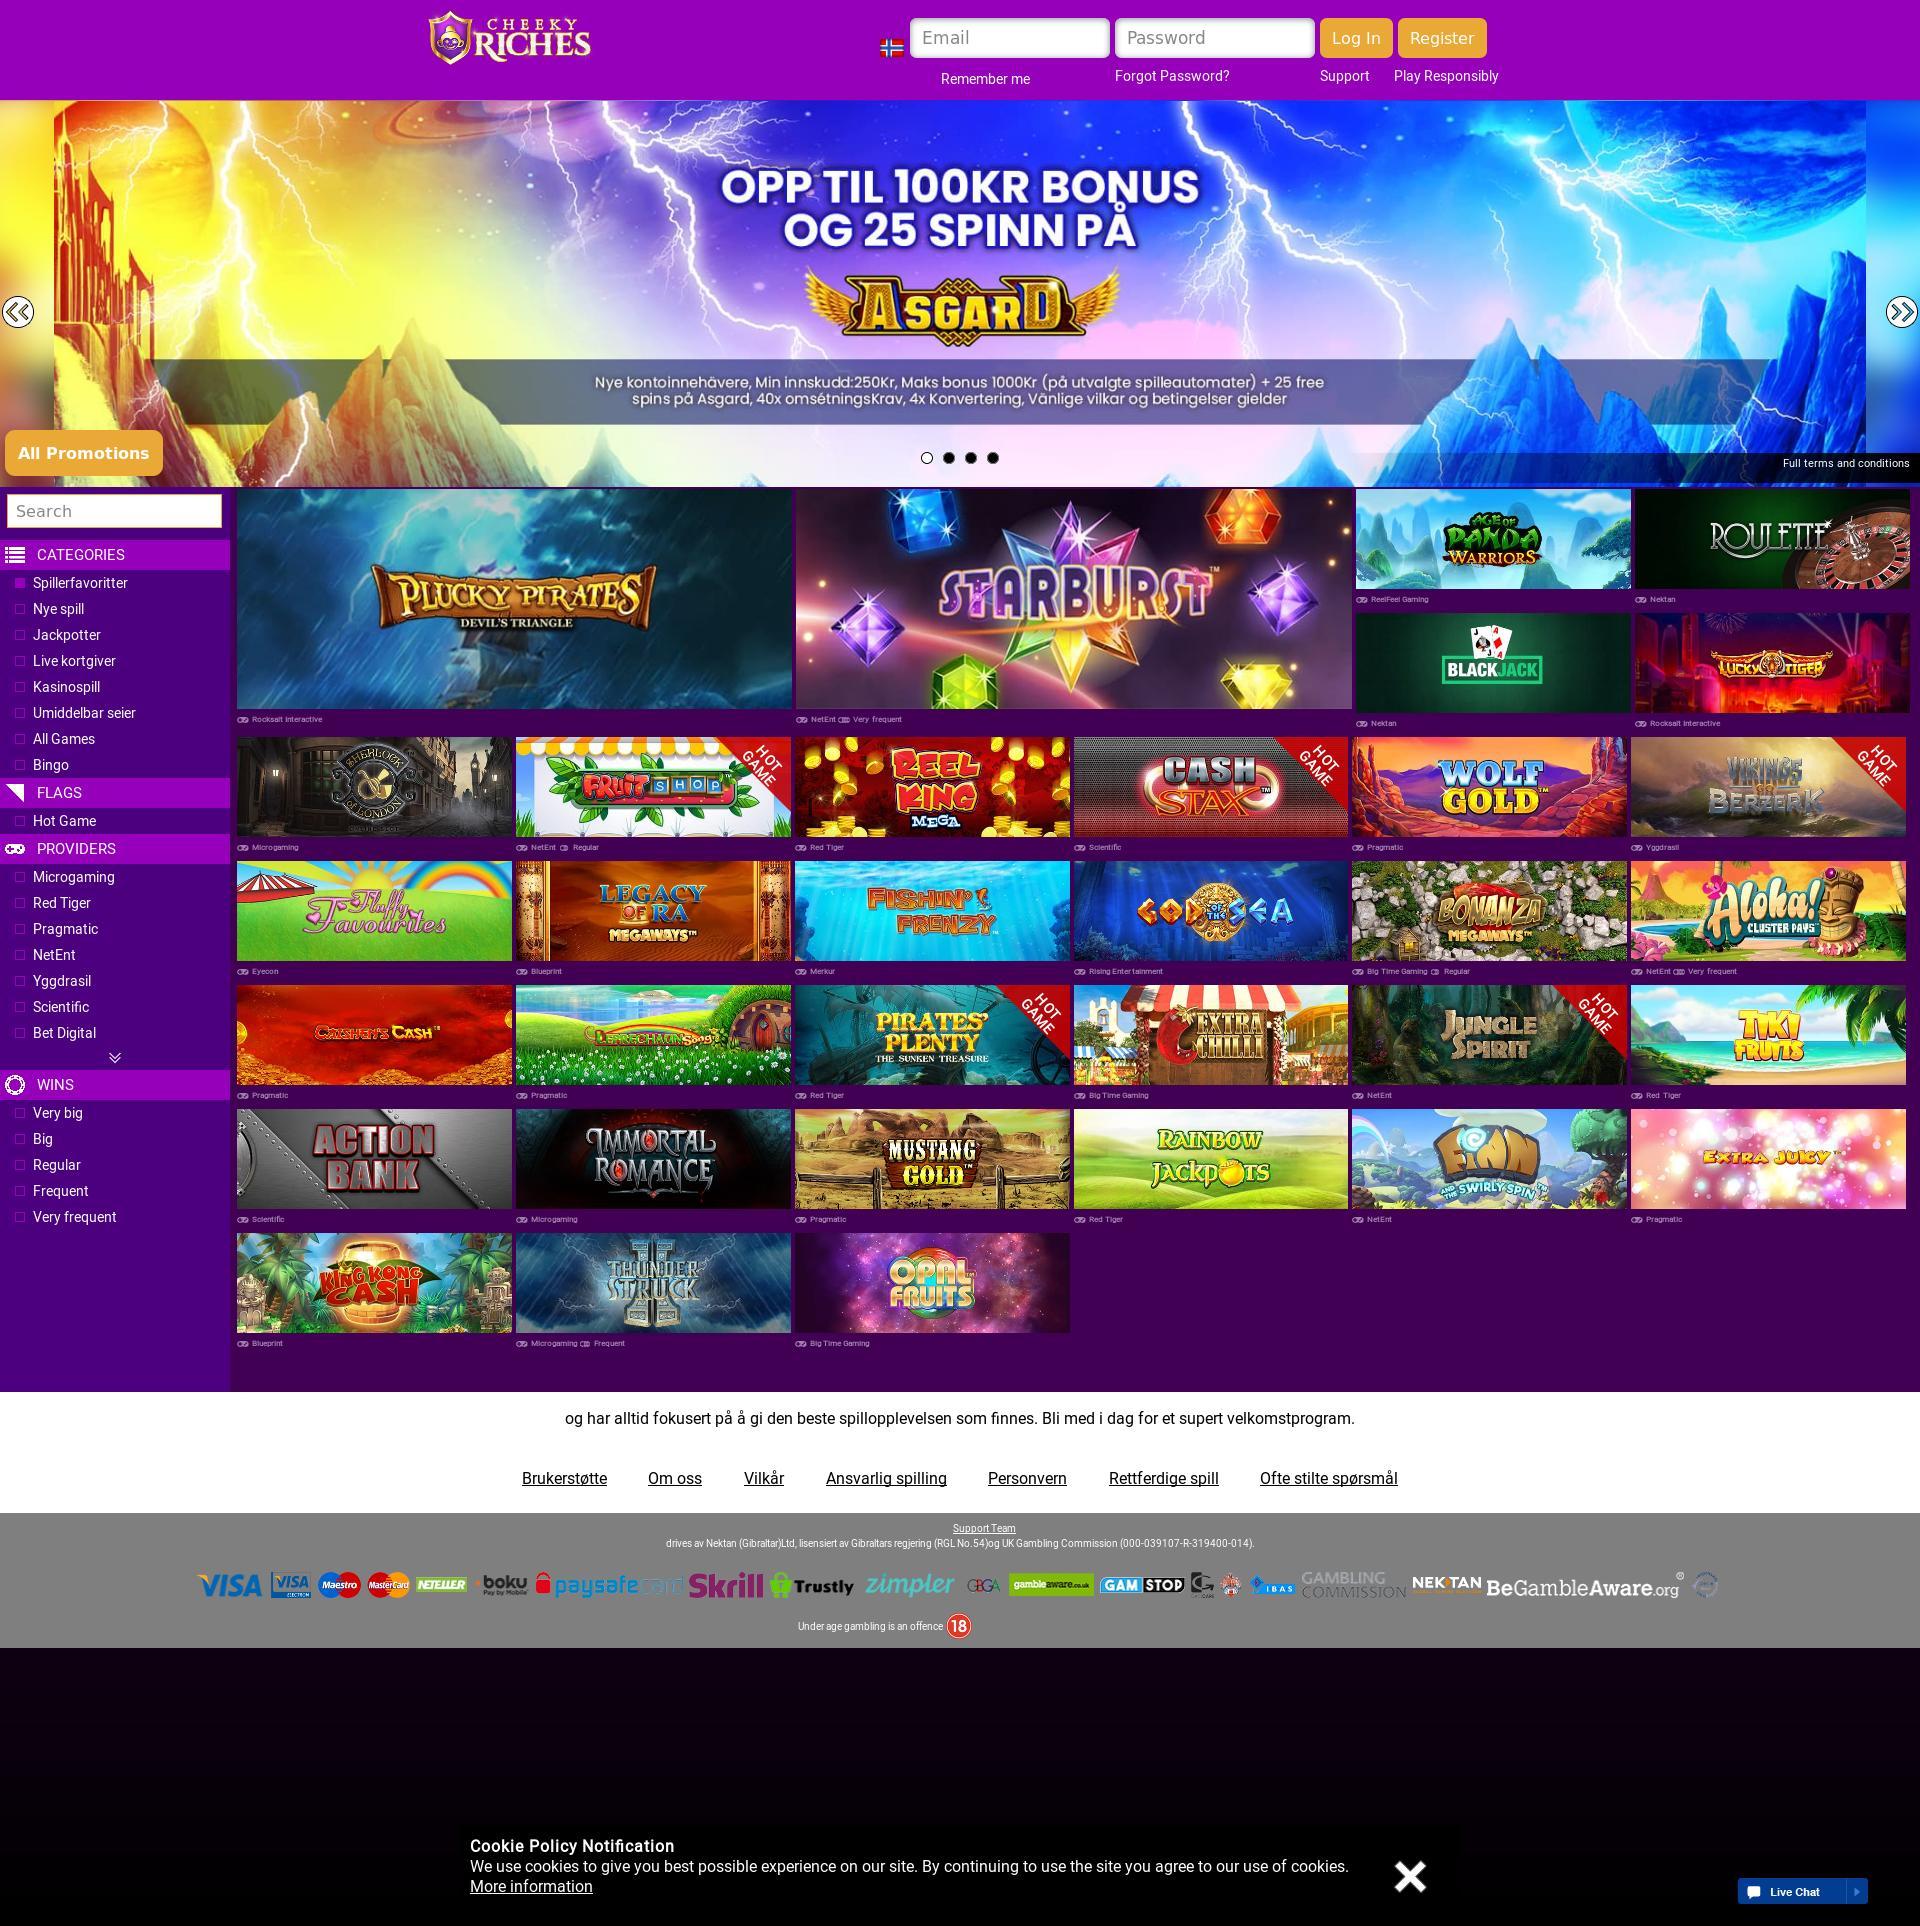 Casino screen Lobby 2019-07-15 for Norway